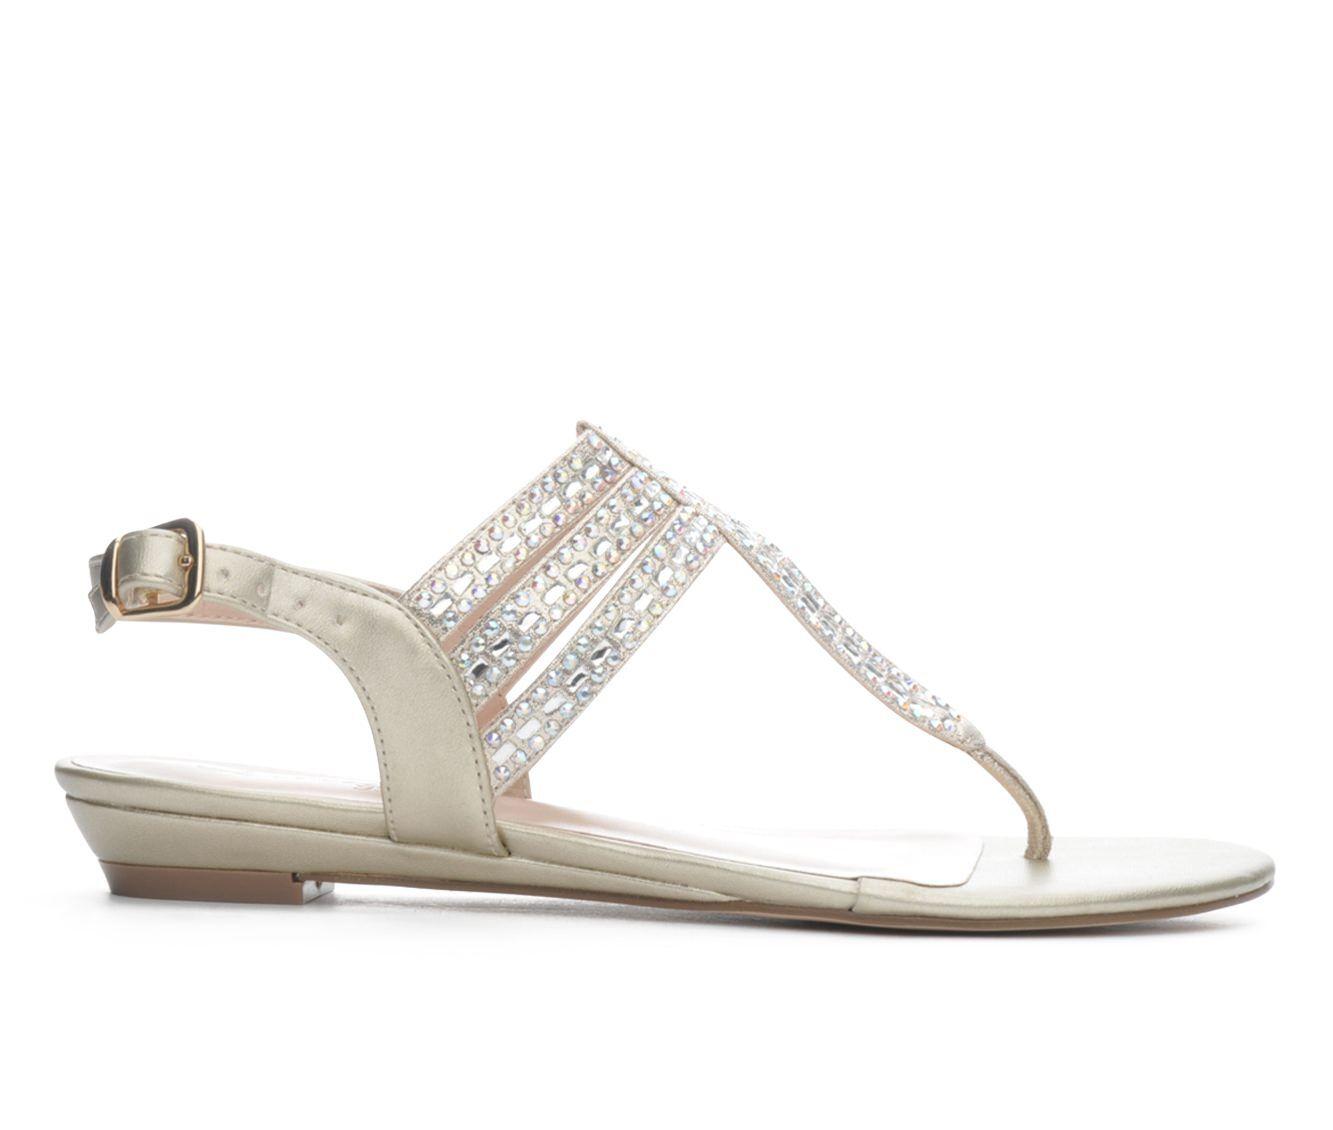 dress sandals